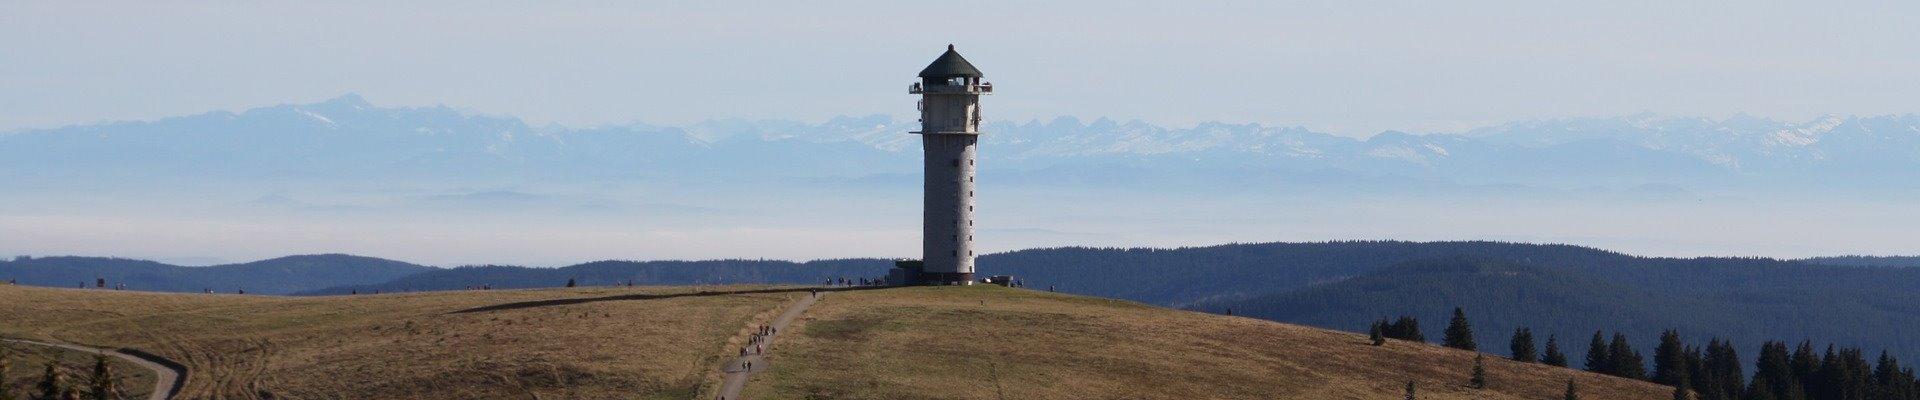 Erlebnis Slider 1920x400: Feldberg mit Feldbergturm